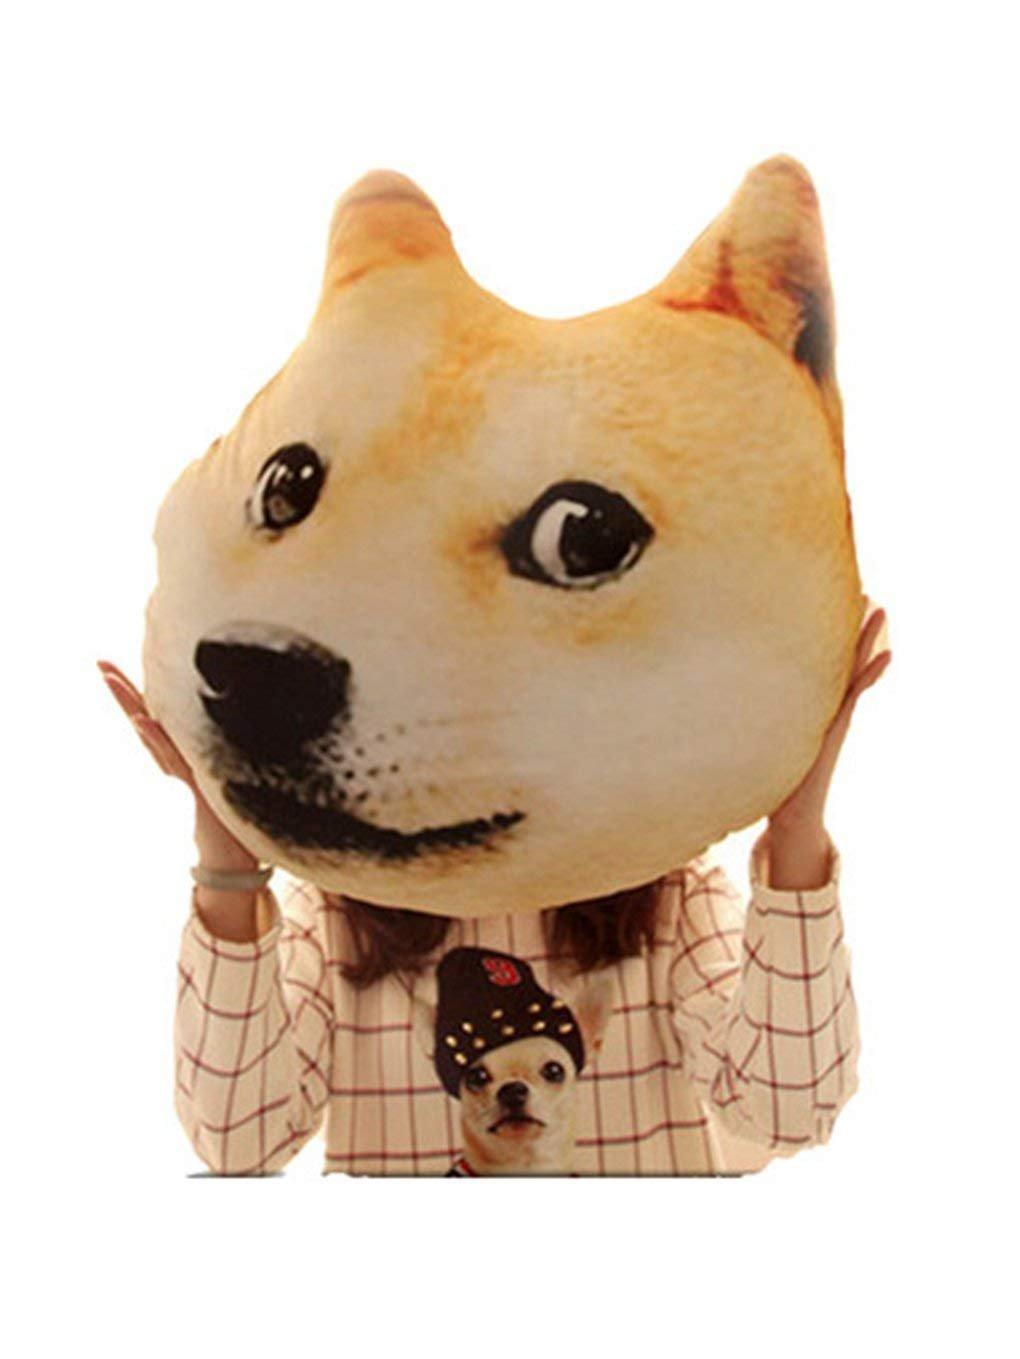 Ganesa Deepak 3D Printed Husky pillow Yollow Dog Sofa Husky Doge Face Car Cushion (yellow dog)